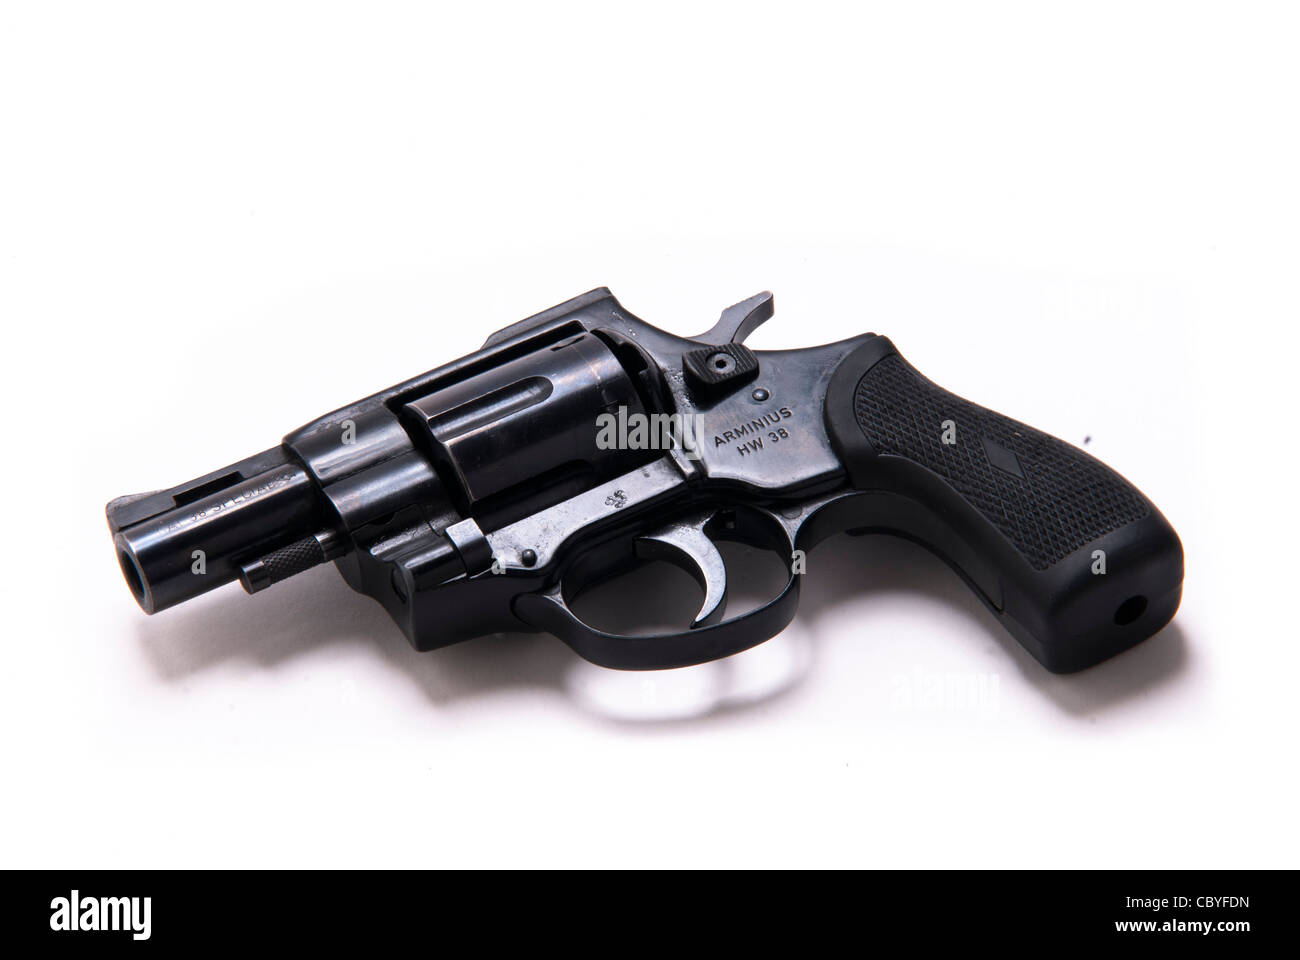 close up of revolver on white background Stock Photo: 41786801 - Alamy